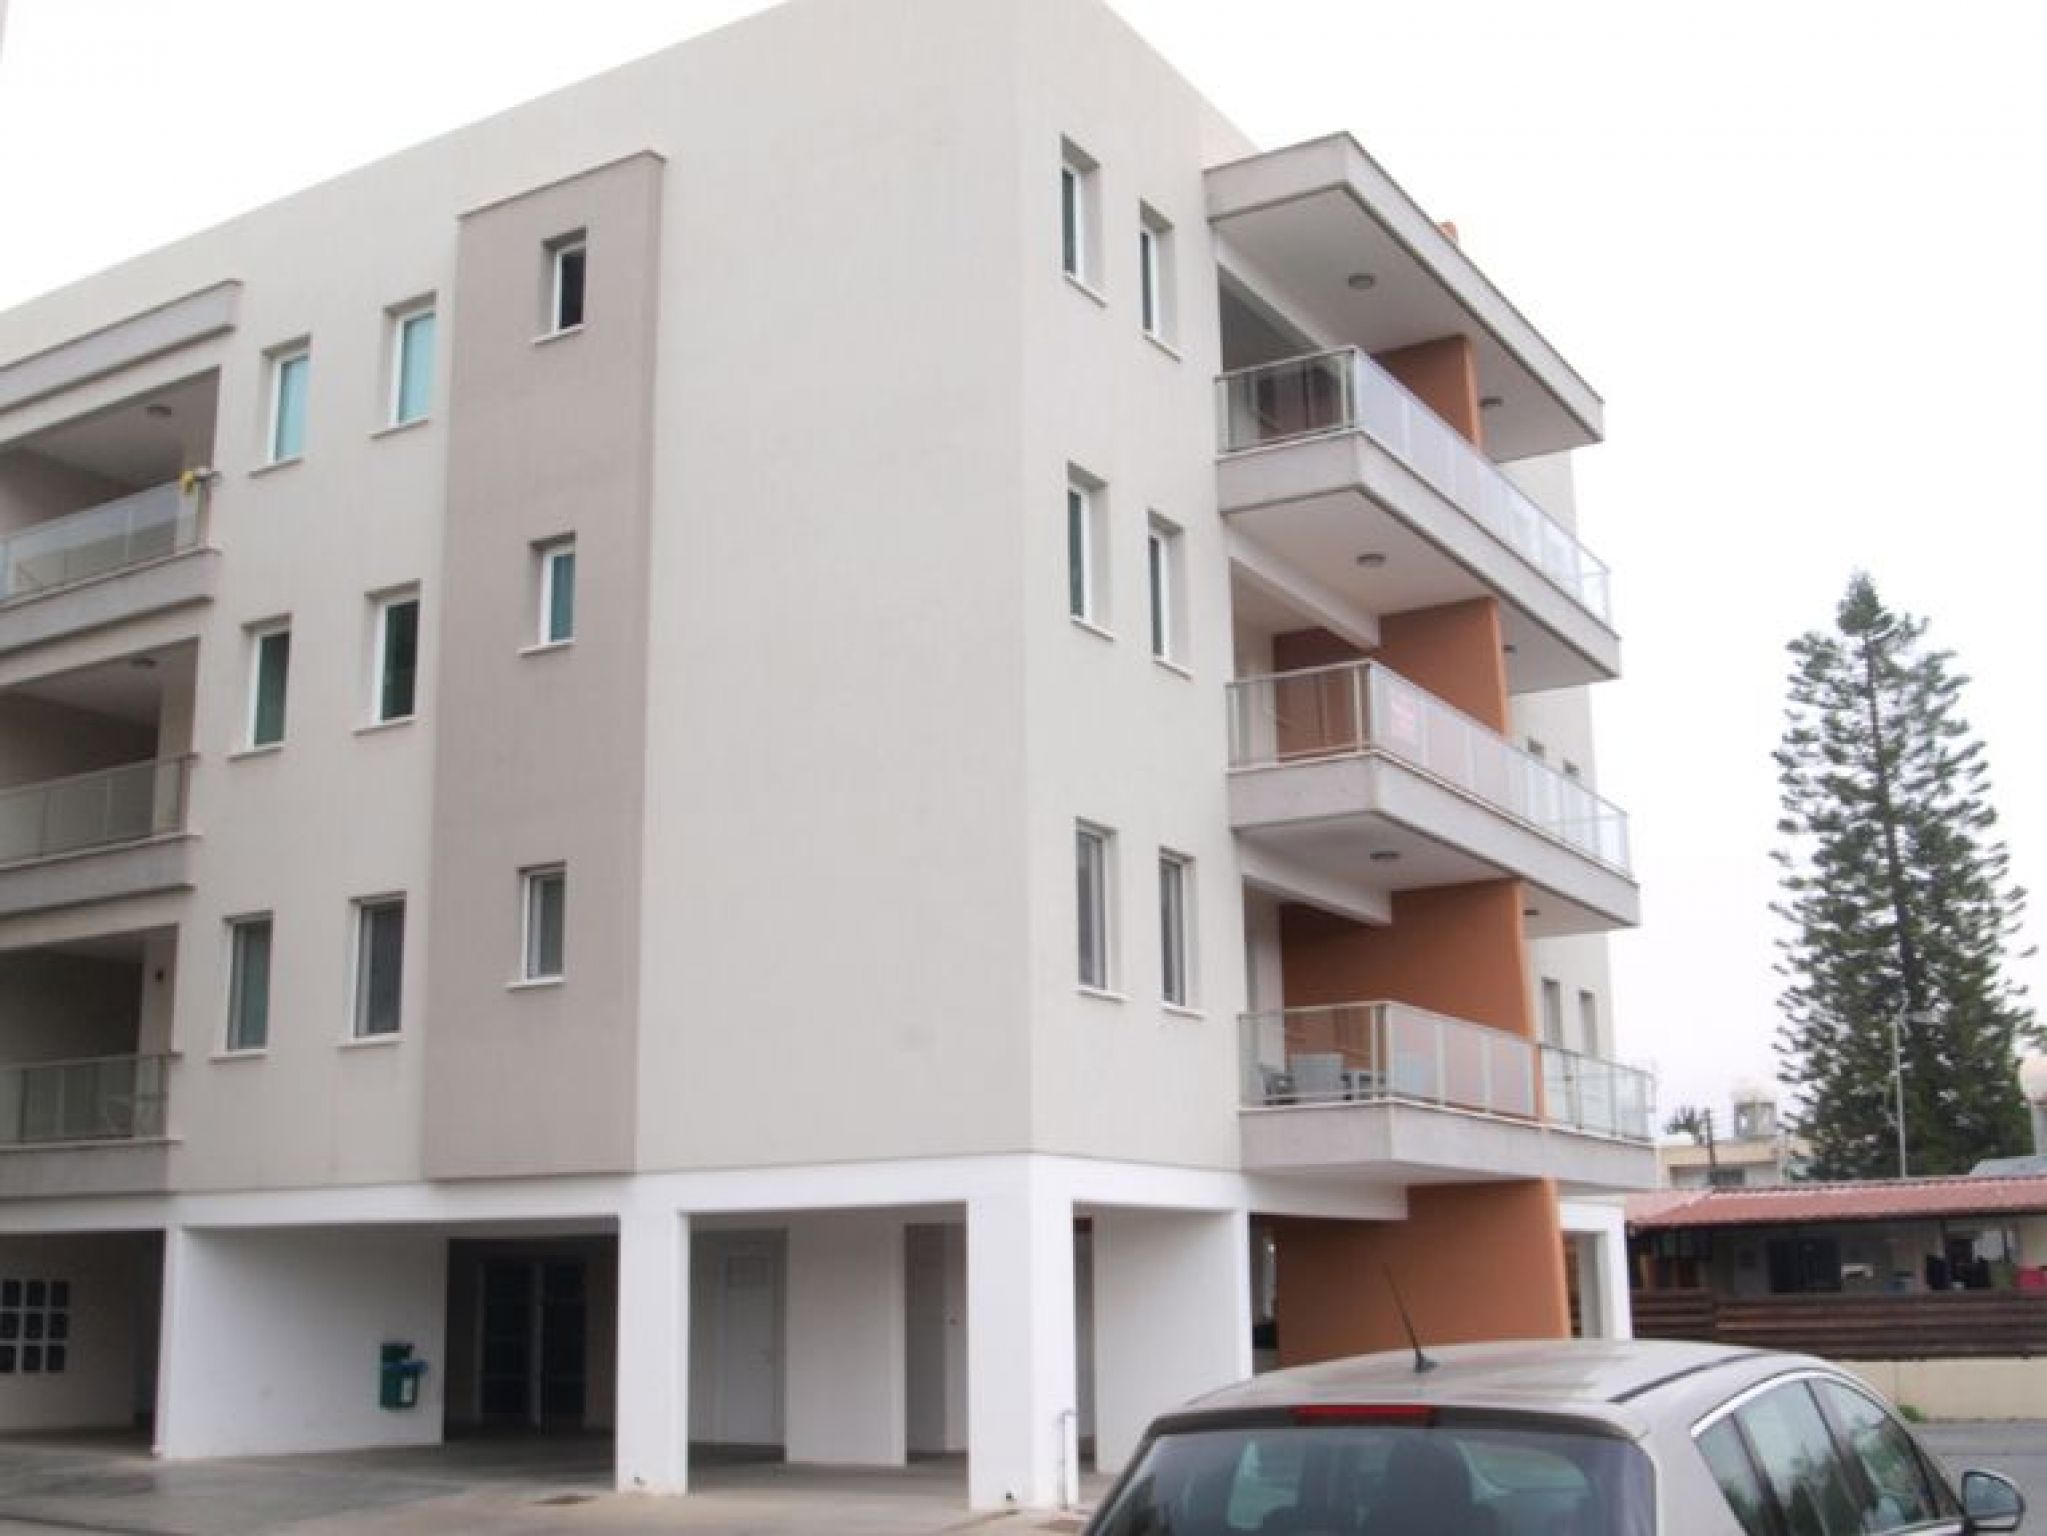 2nd floor 2 bedroom apartment in Kato Polemidia, Limassol  2.....